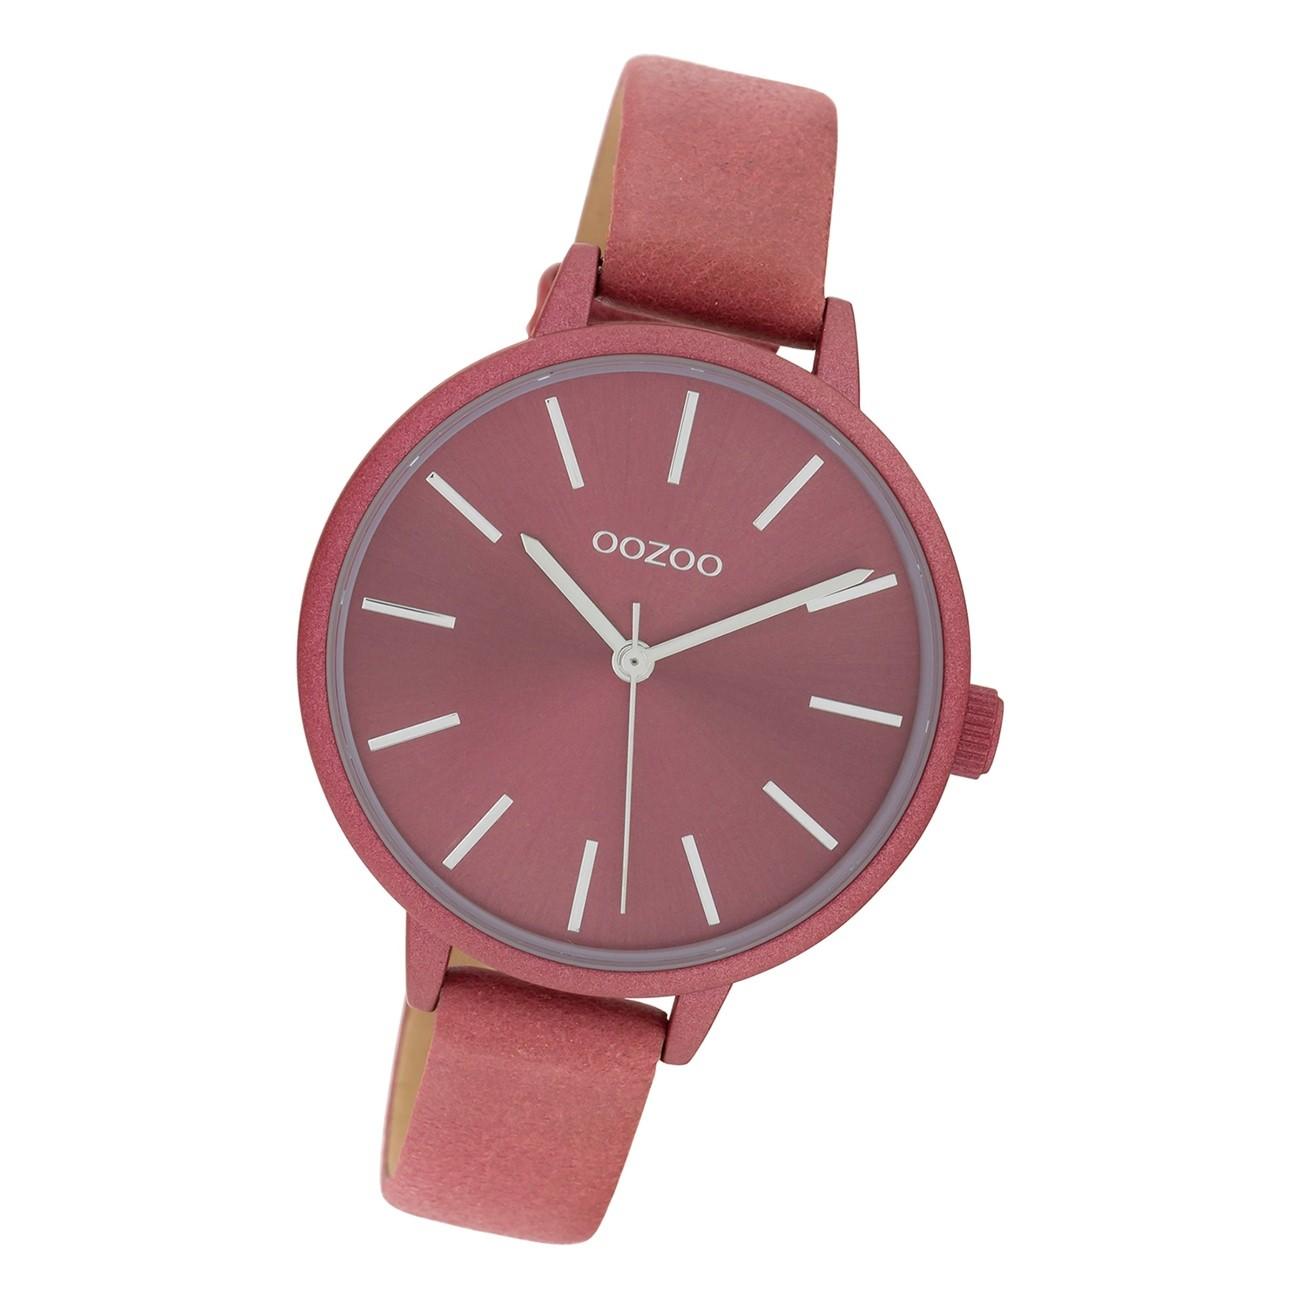 Oozoo Damen Armbanduhr Timepieces C10258 Analog Leder altrosa UOC10258